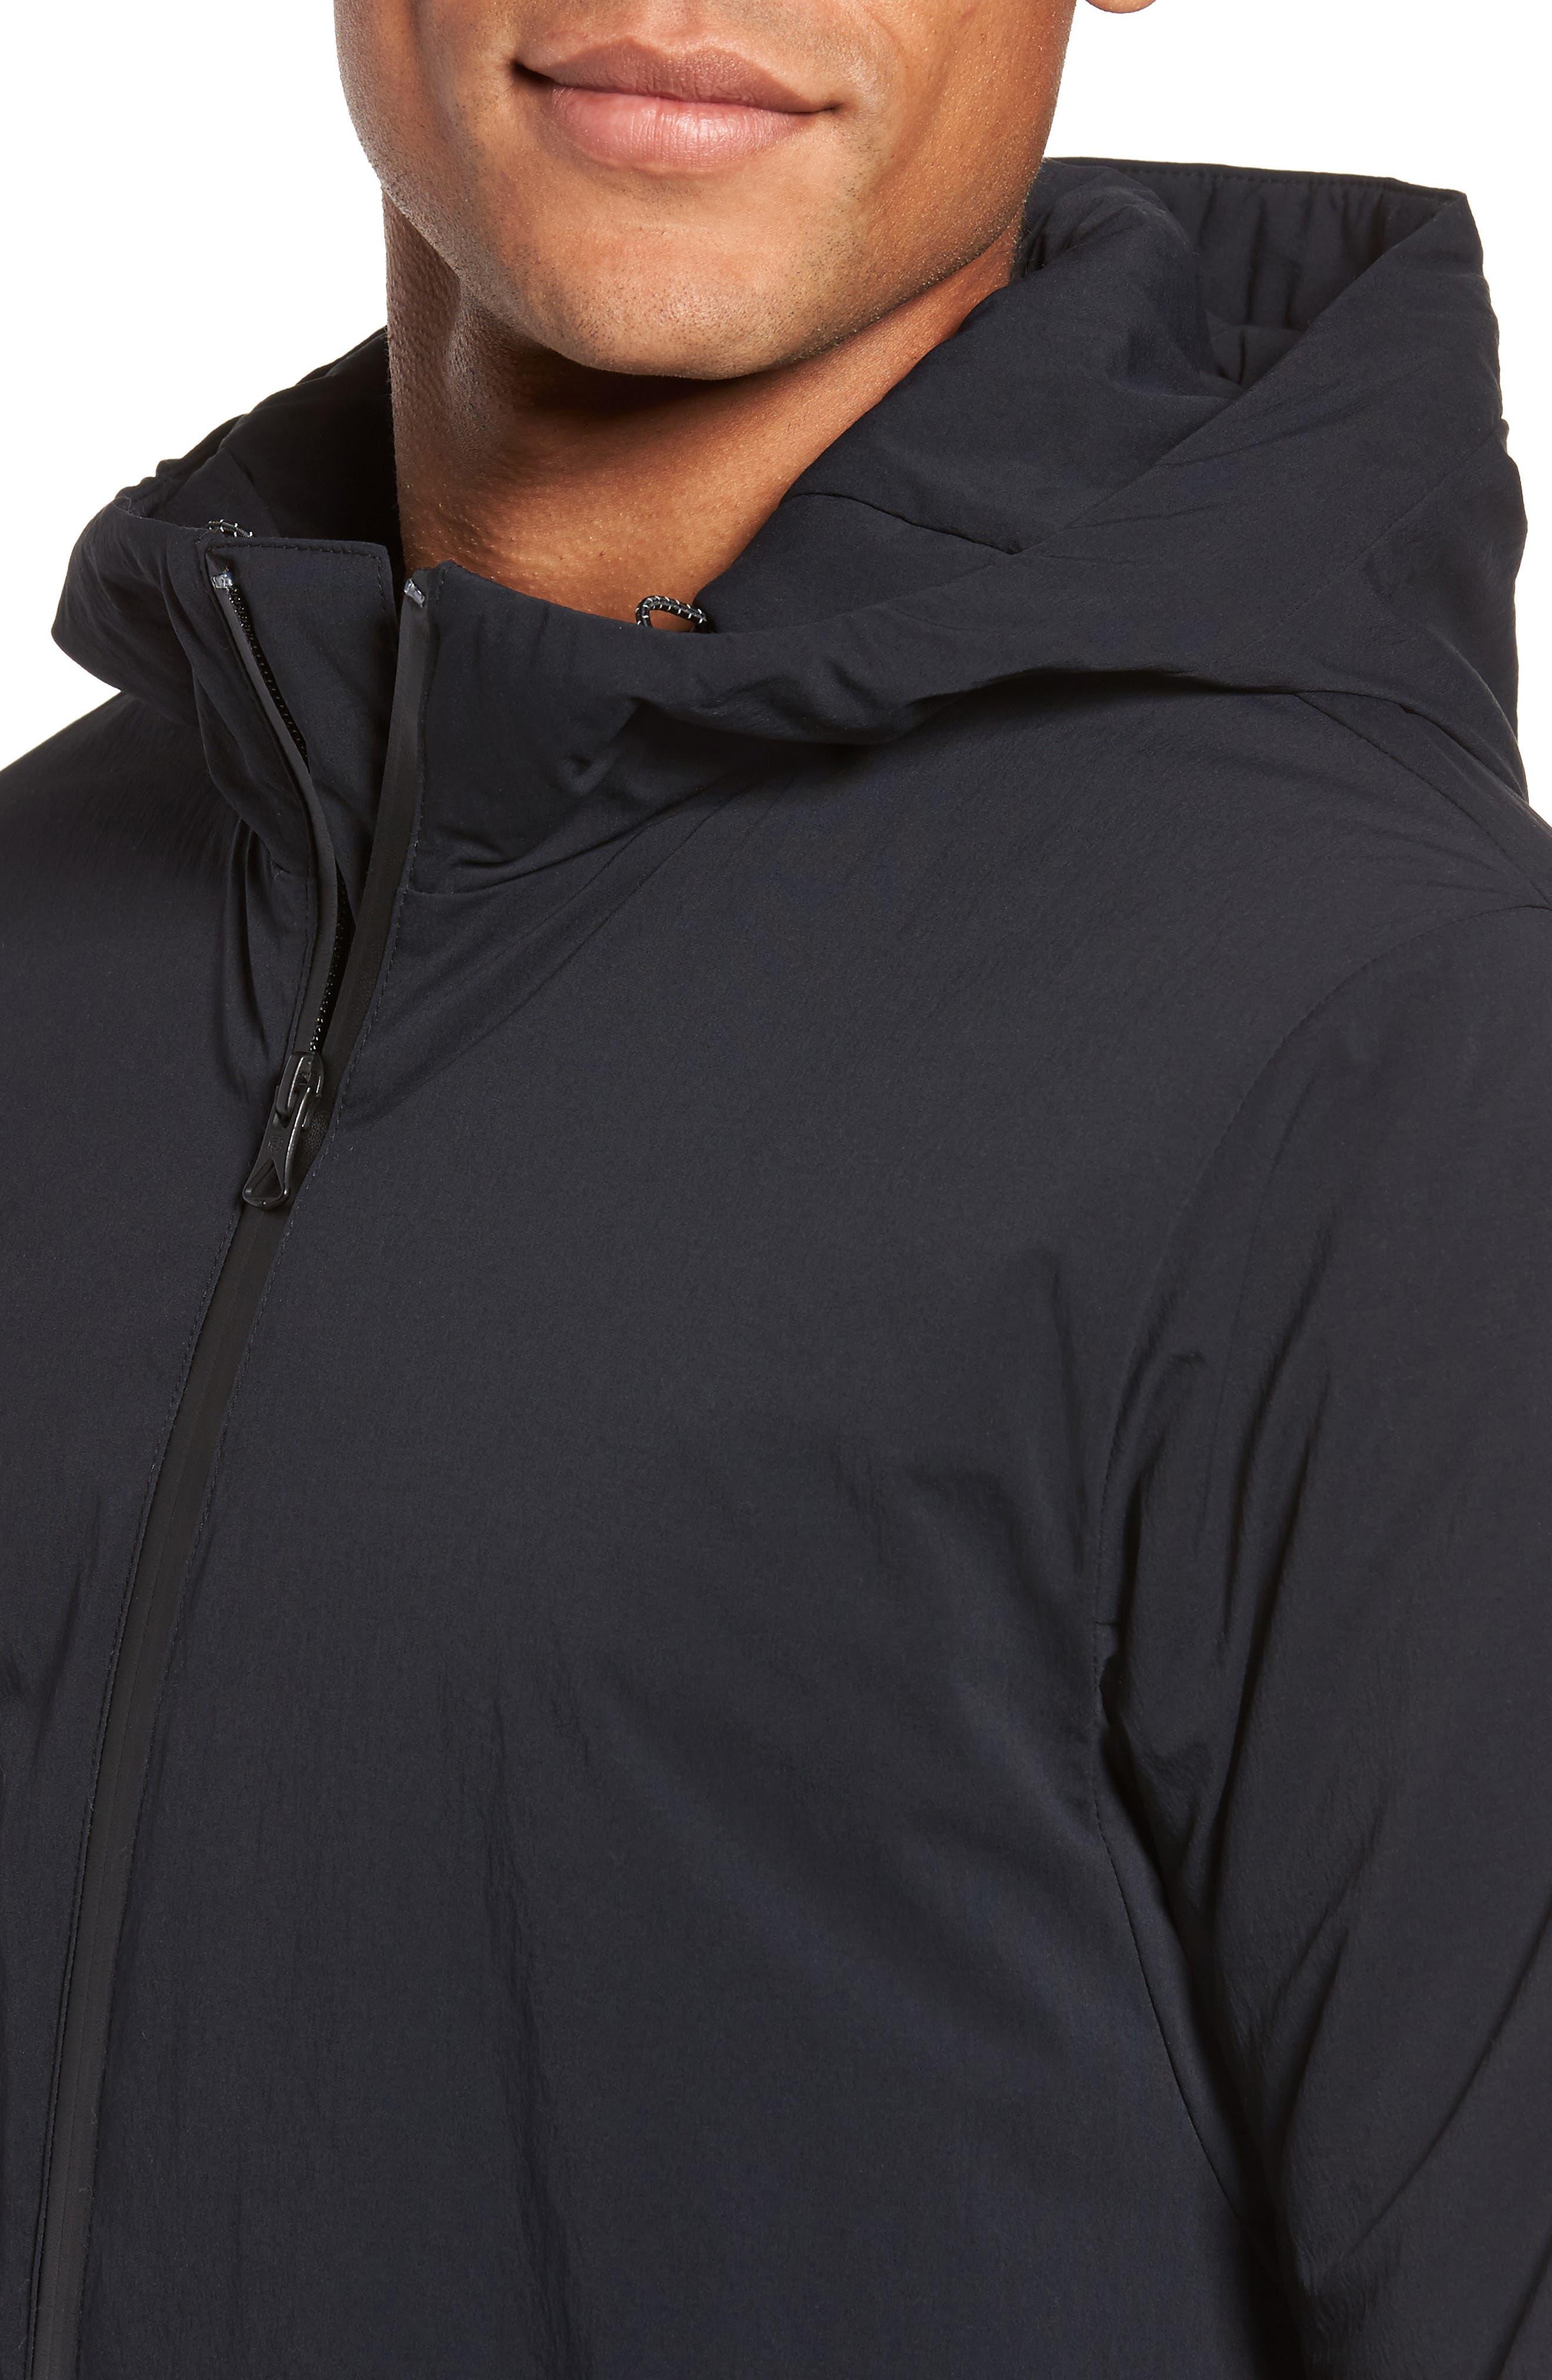 Alternate Image 4  - Reigning Champ Insulated Trim Sideline Jacket